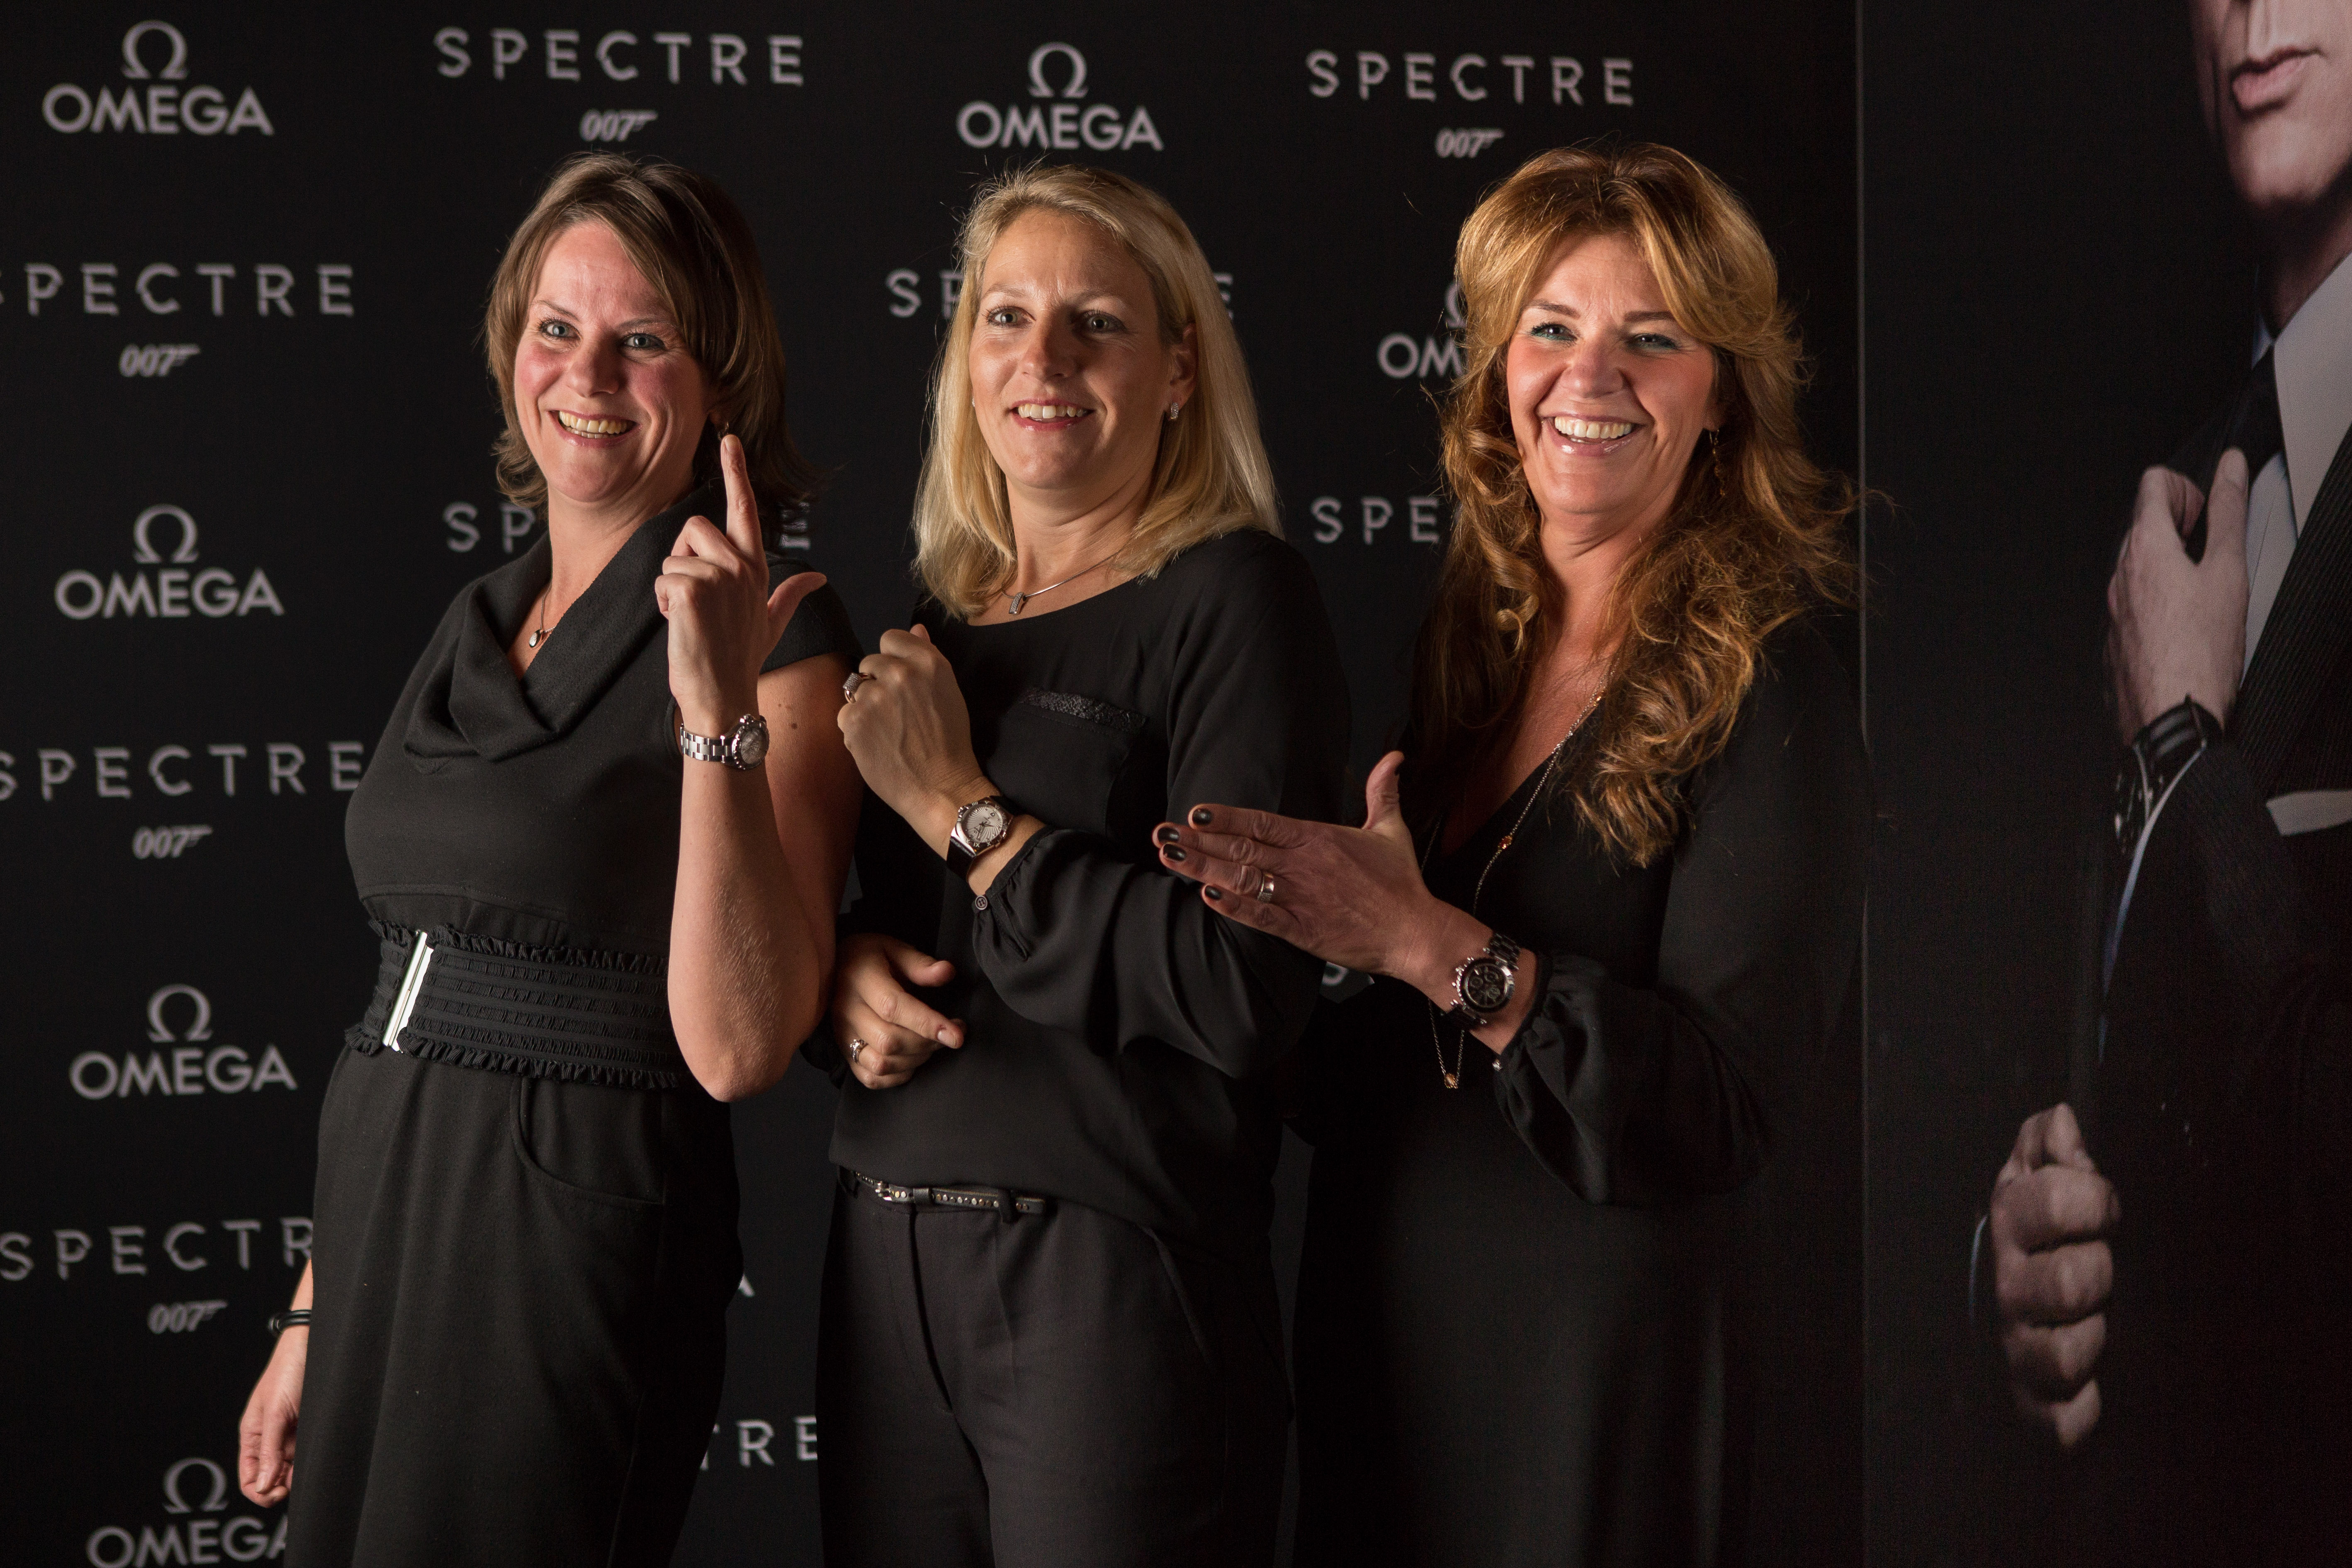 spectre-omega wall-23